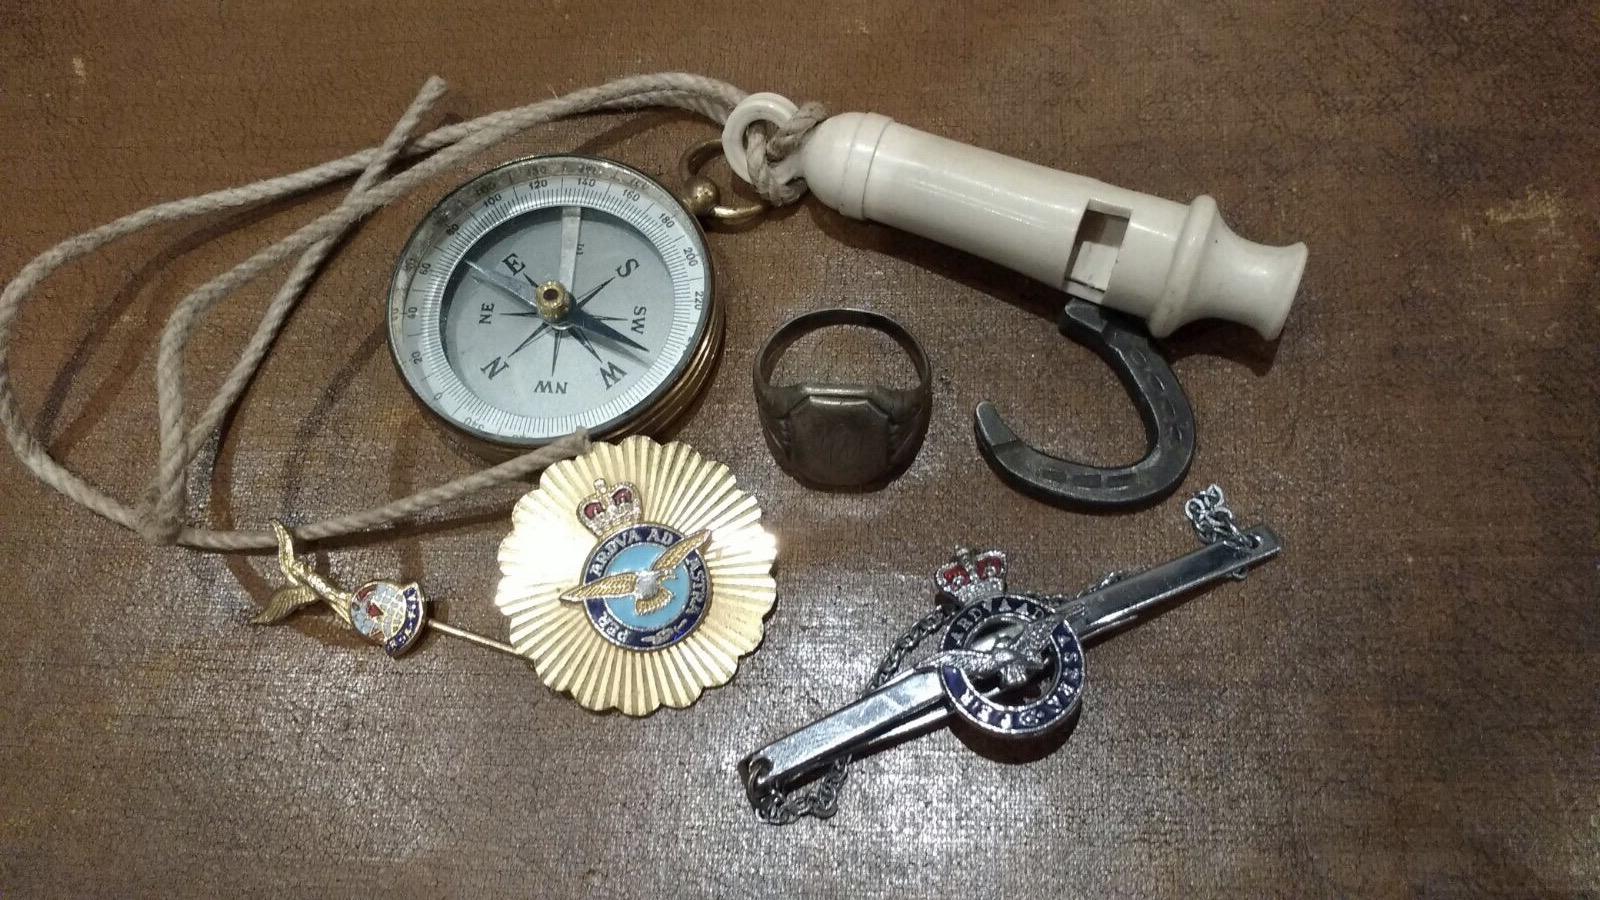 WW2 Spitfire Pilot's Gun Camera And Memorabilia (Multiple Images 1 of 31) - Image 29 of 31